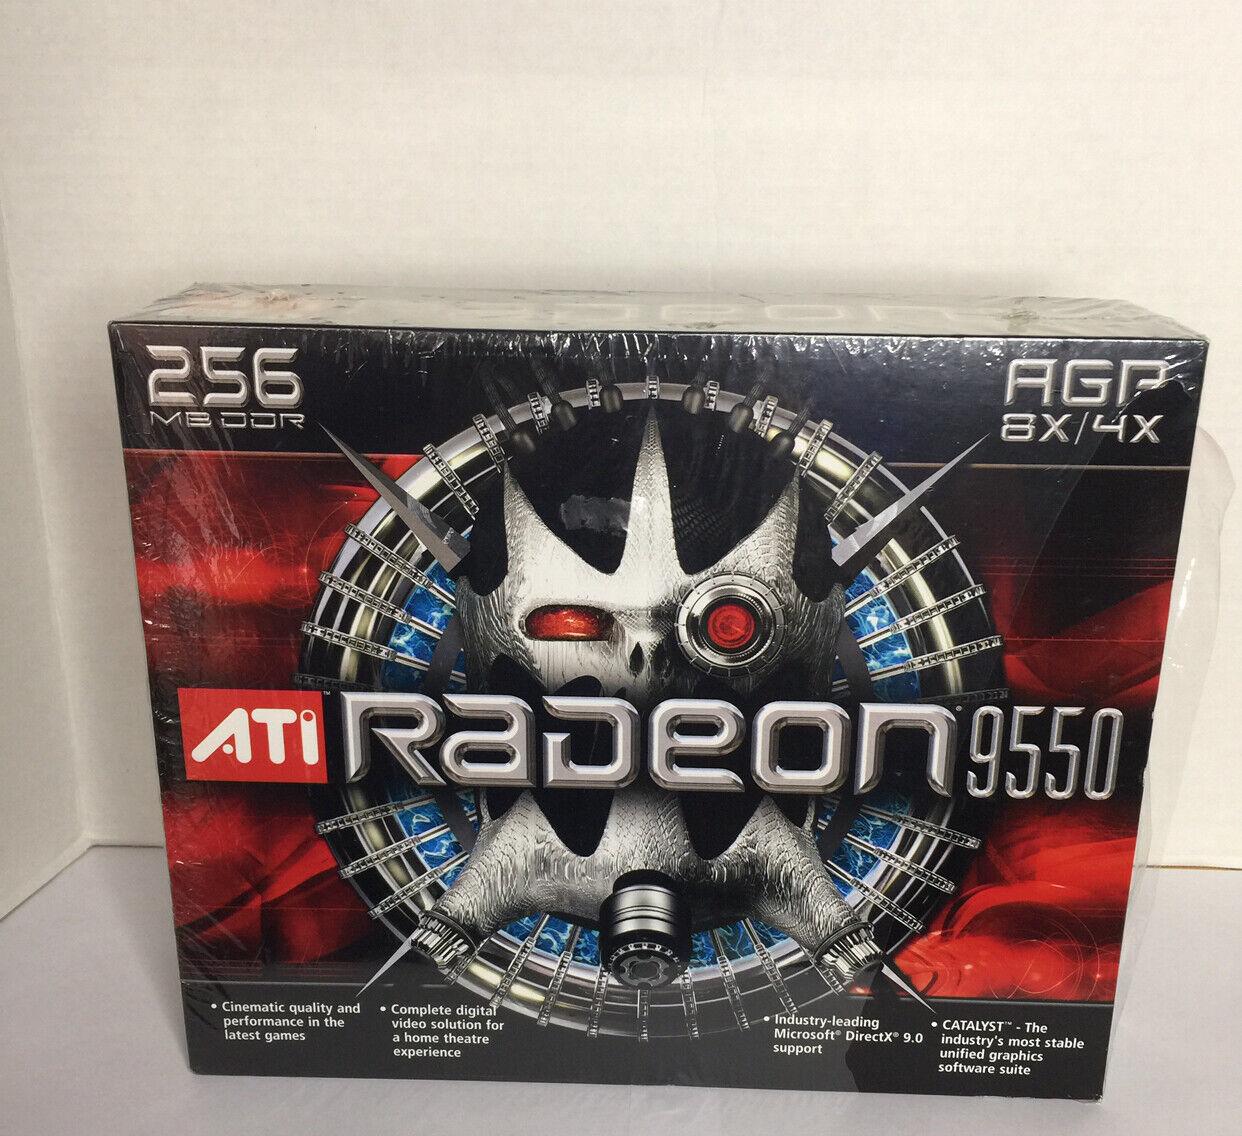 ATI Radeon 9550 Video Card Brand New Factory Sealed